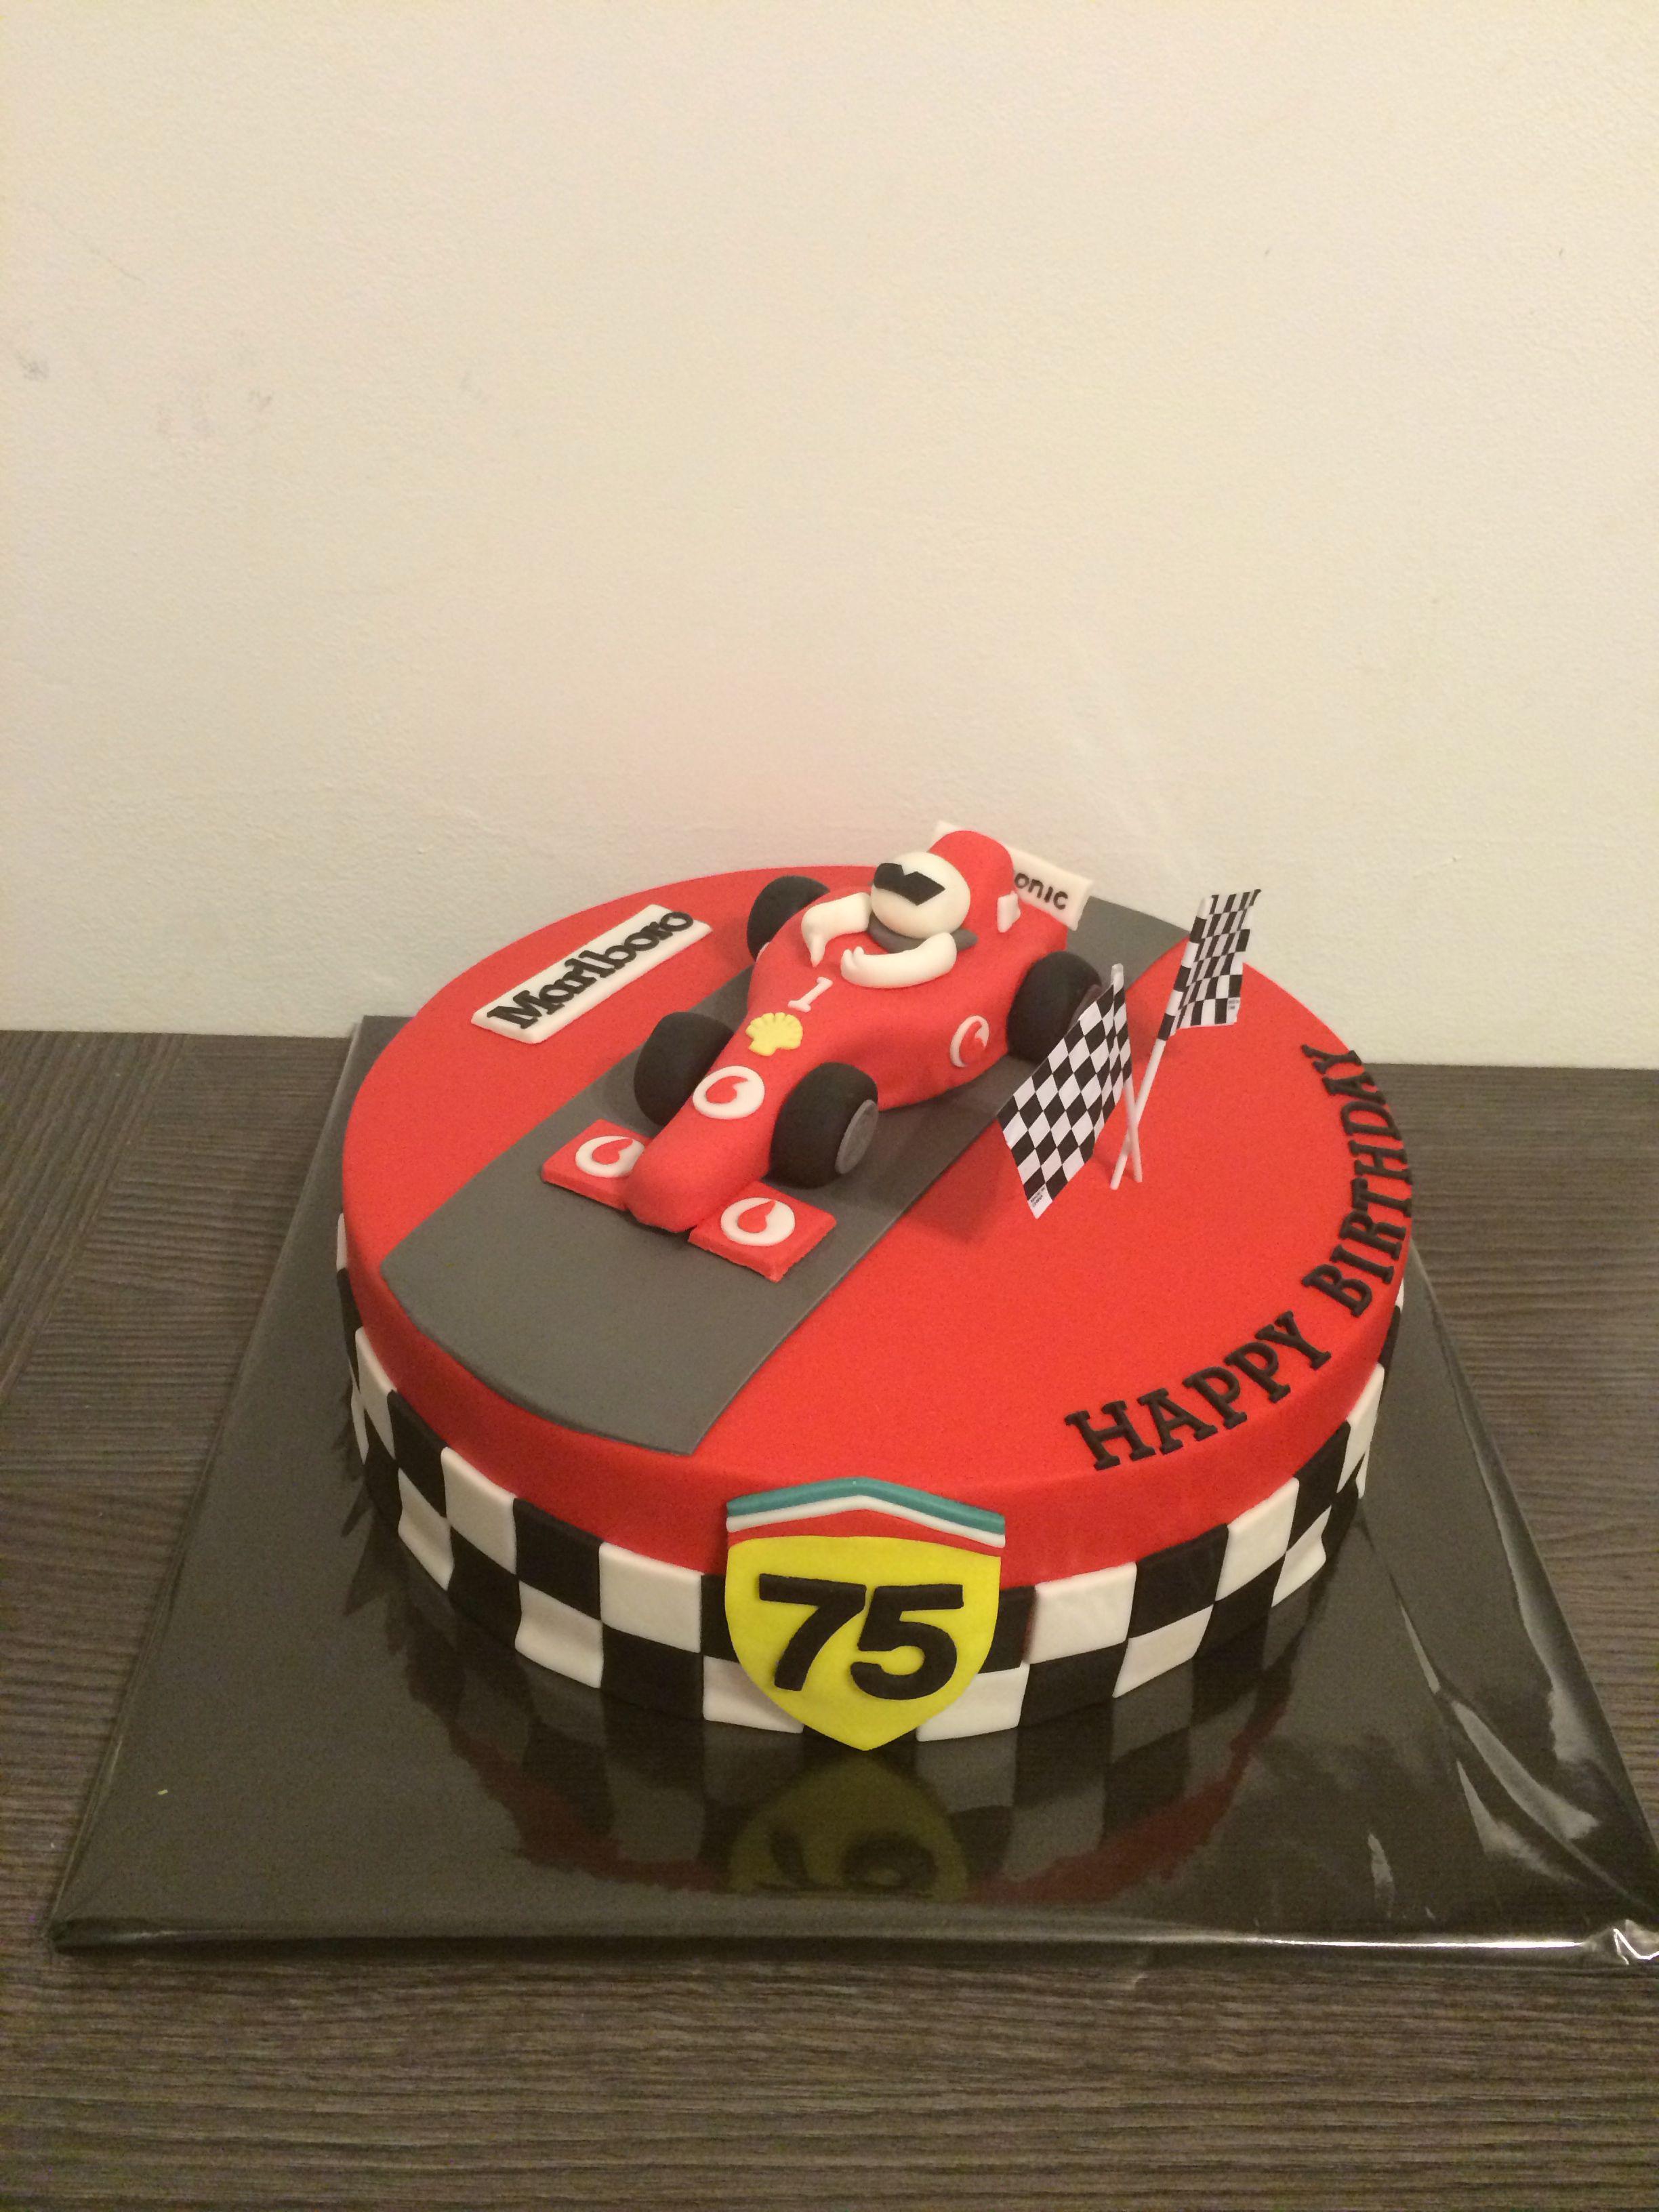 Formule 1 Cake Cakes Pinterest Cake No Bake Cake And Party Cakes